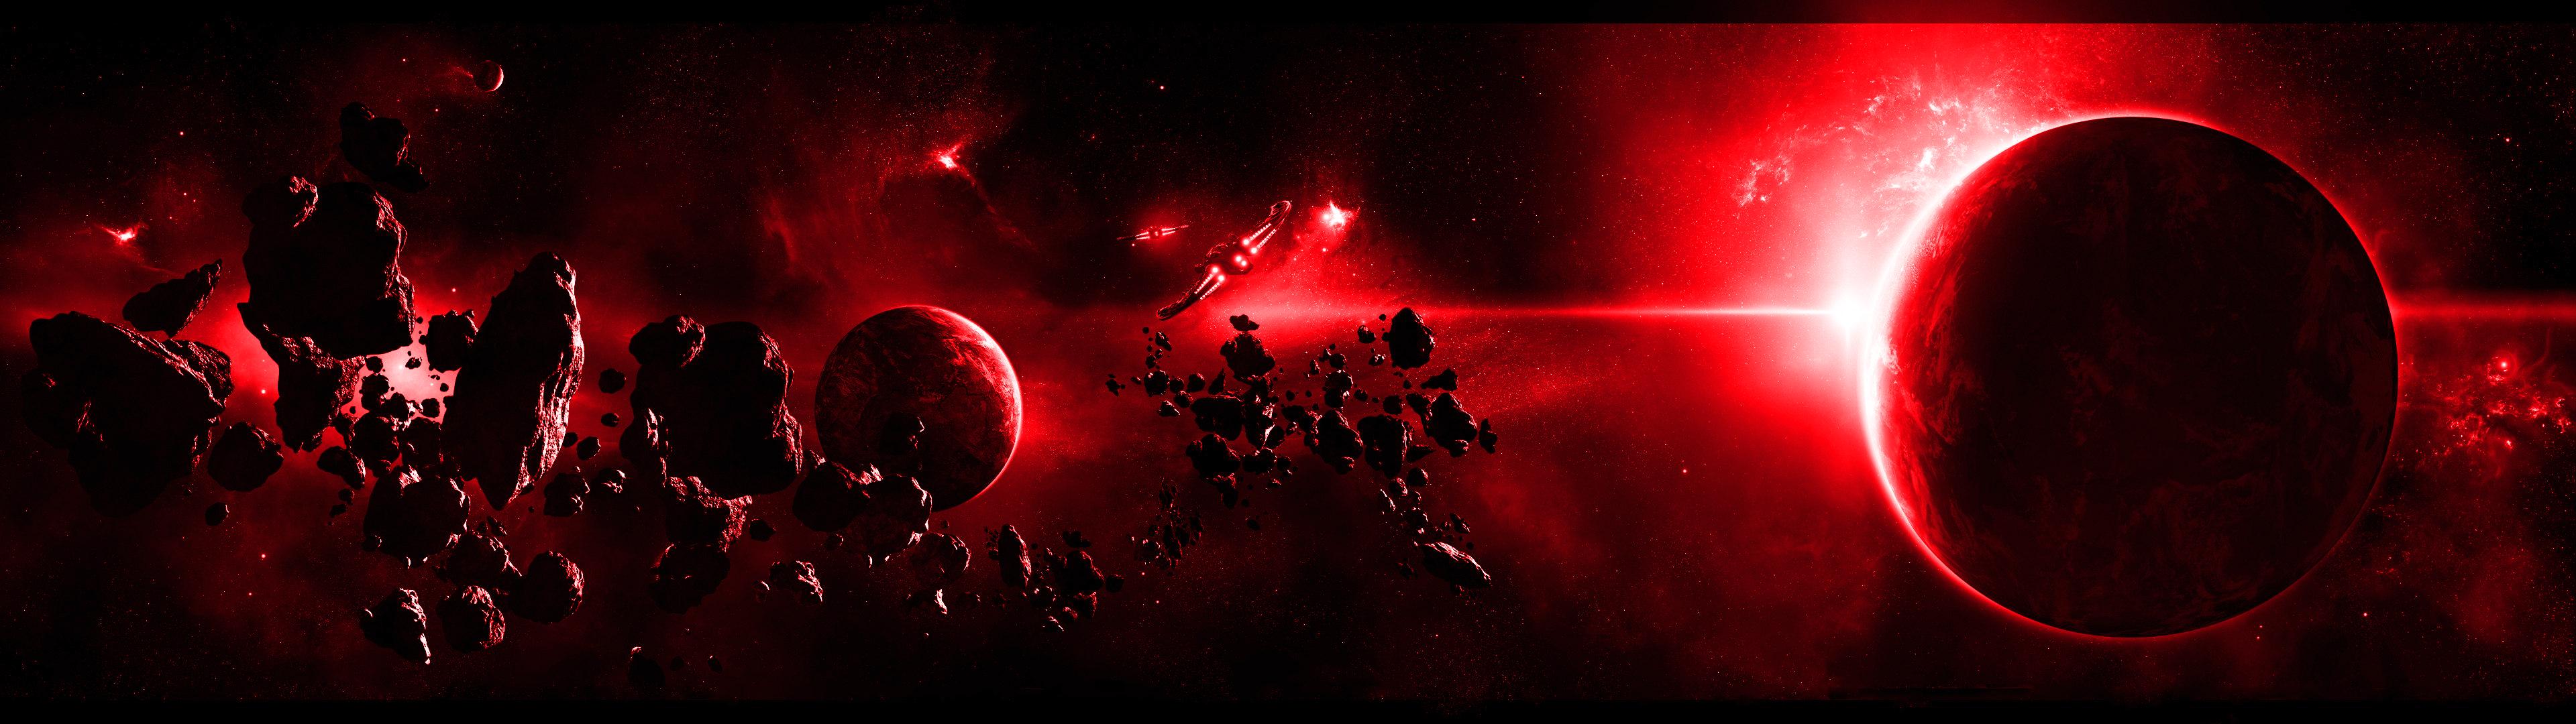 Planète Fond d'écran HD | Arrière-Plan | 3840x1080 | ID:574198 - Wallpaper Abyss